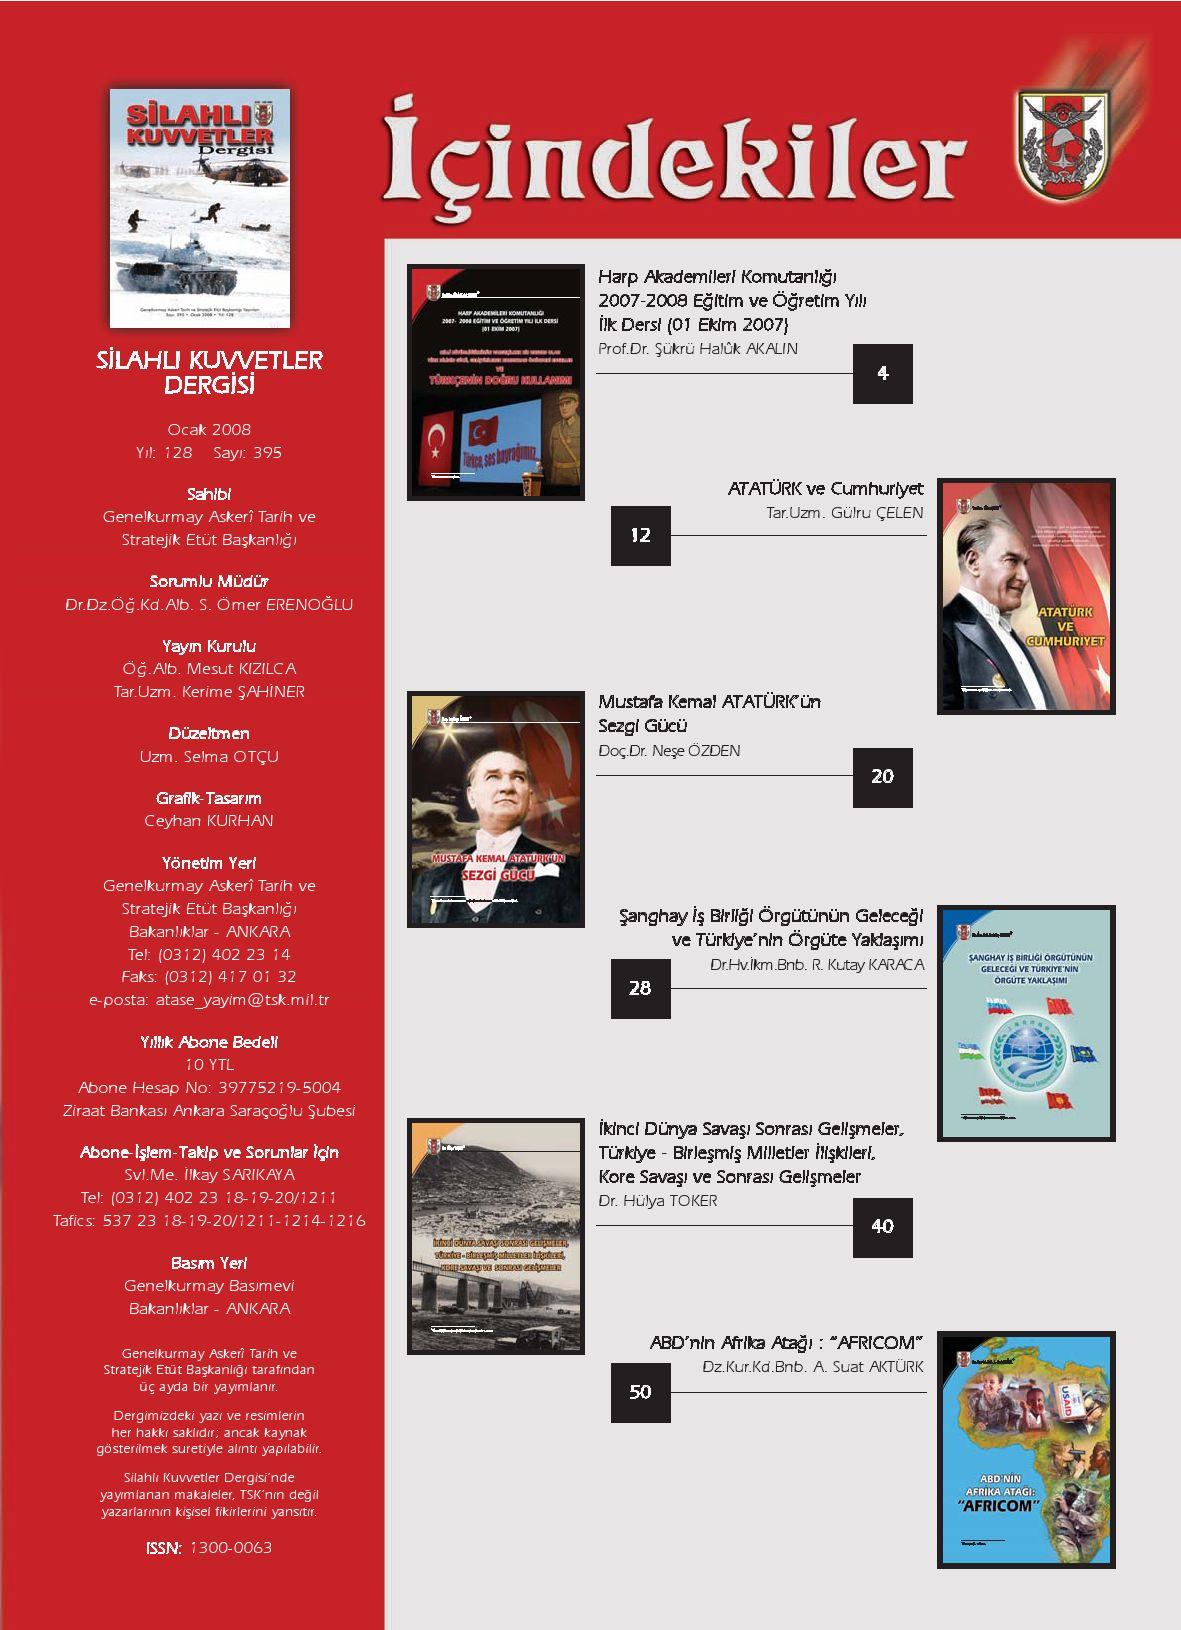 Turk Silahli Kuvvetleri Dergisi By Serdar24 Issuu